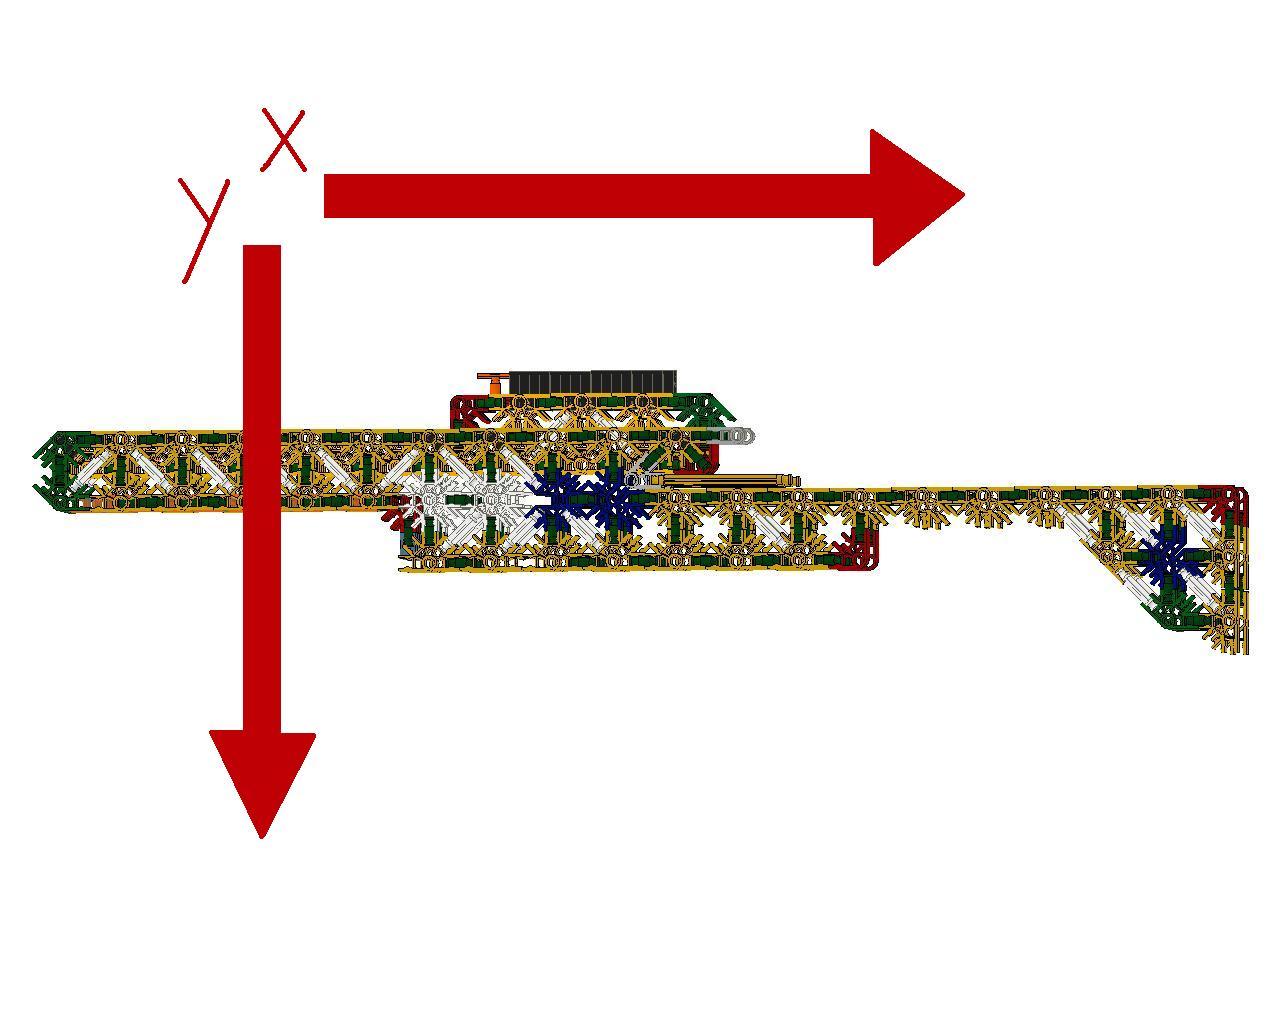 Making A K'nex Model On MlCad